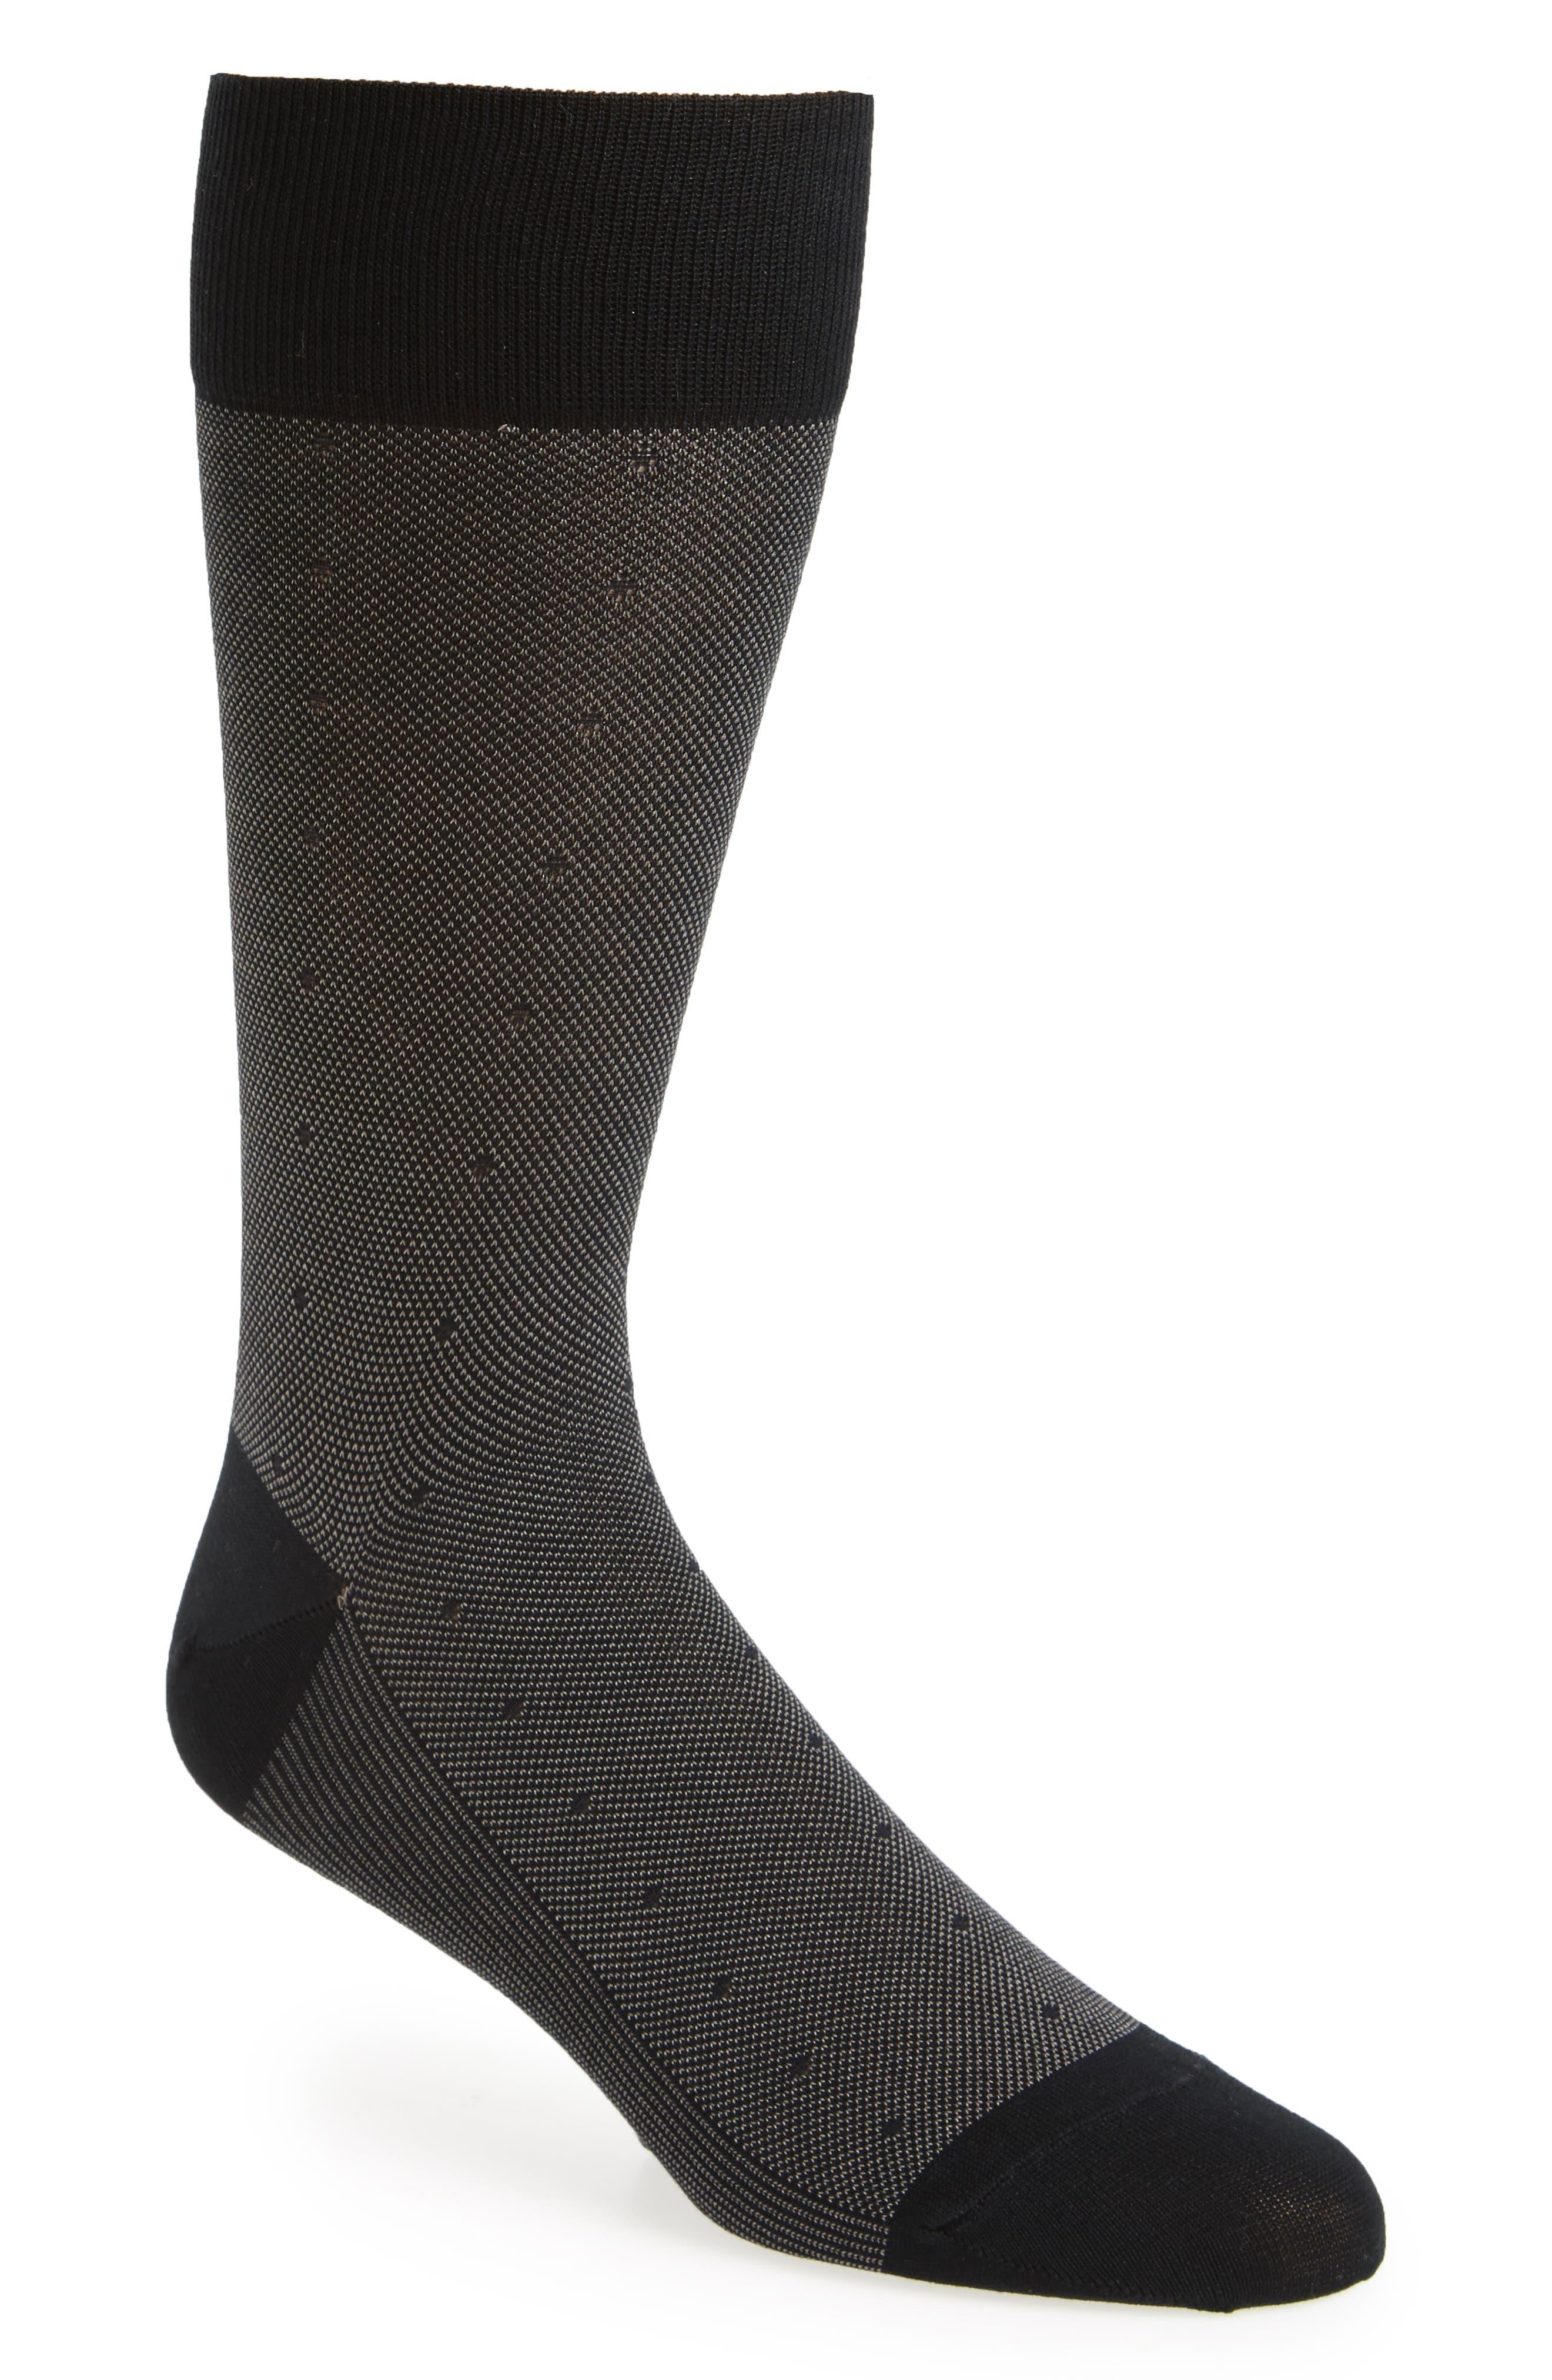 Mercerized Piqué Dot Socks,                         Main,                         color, 021